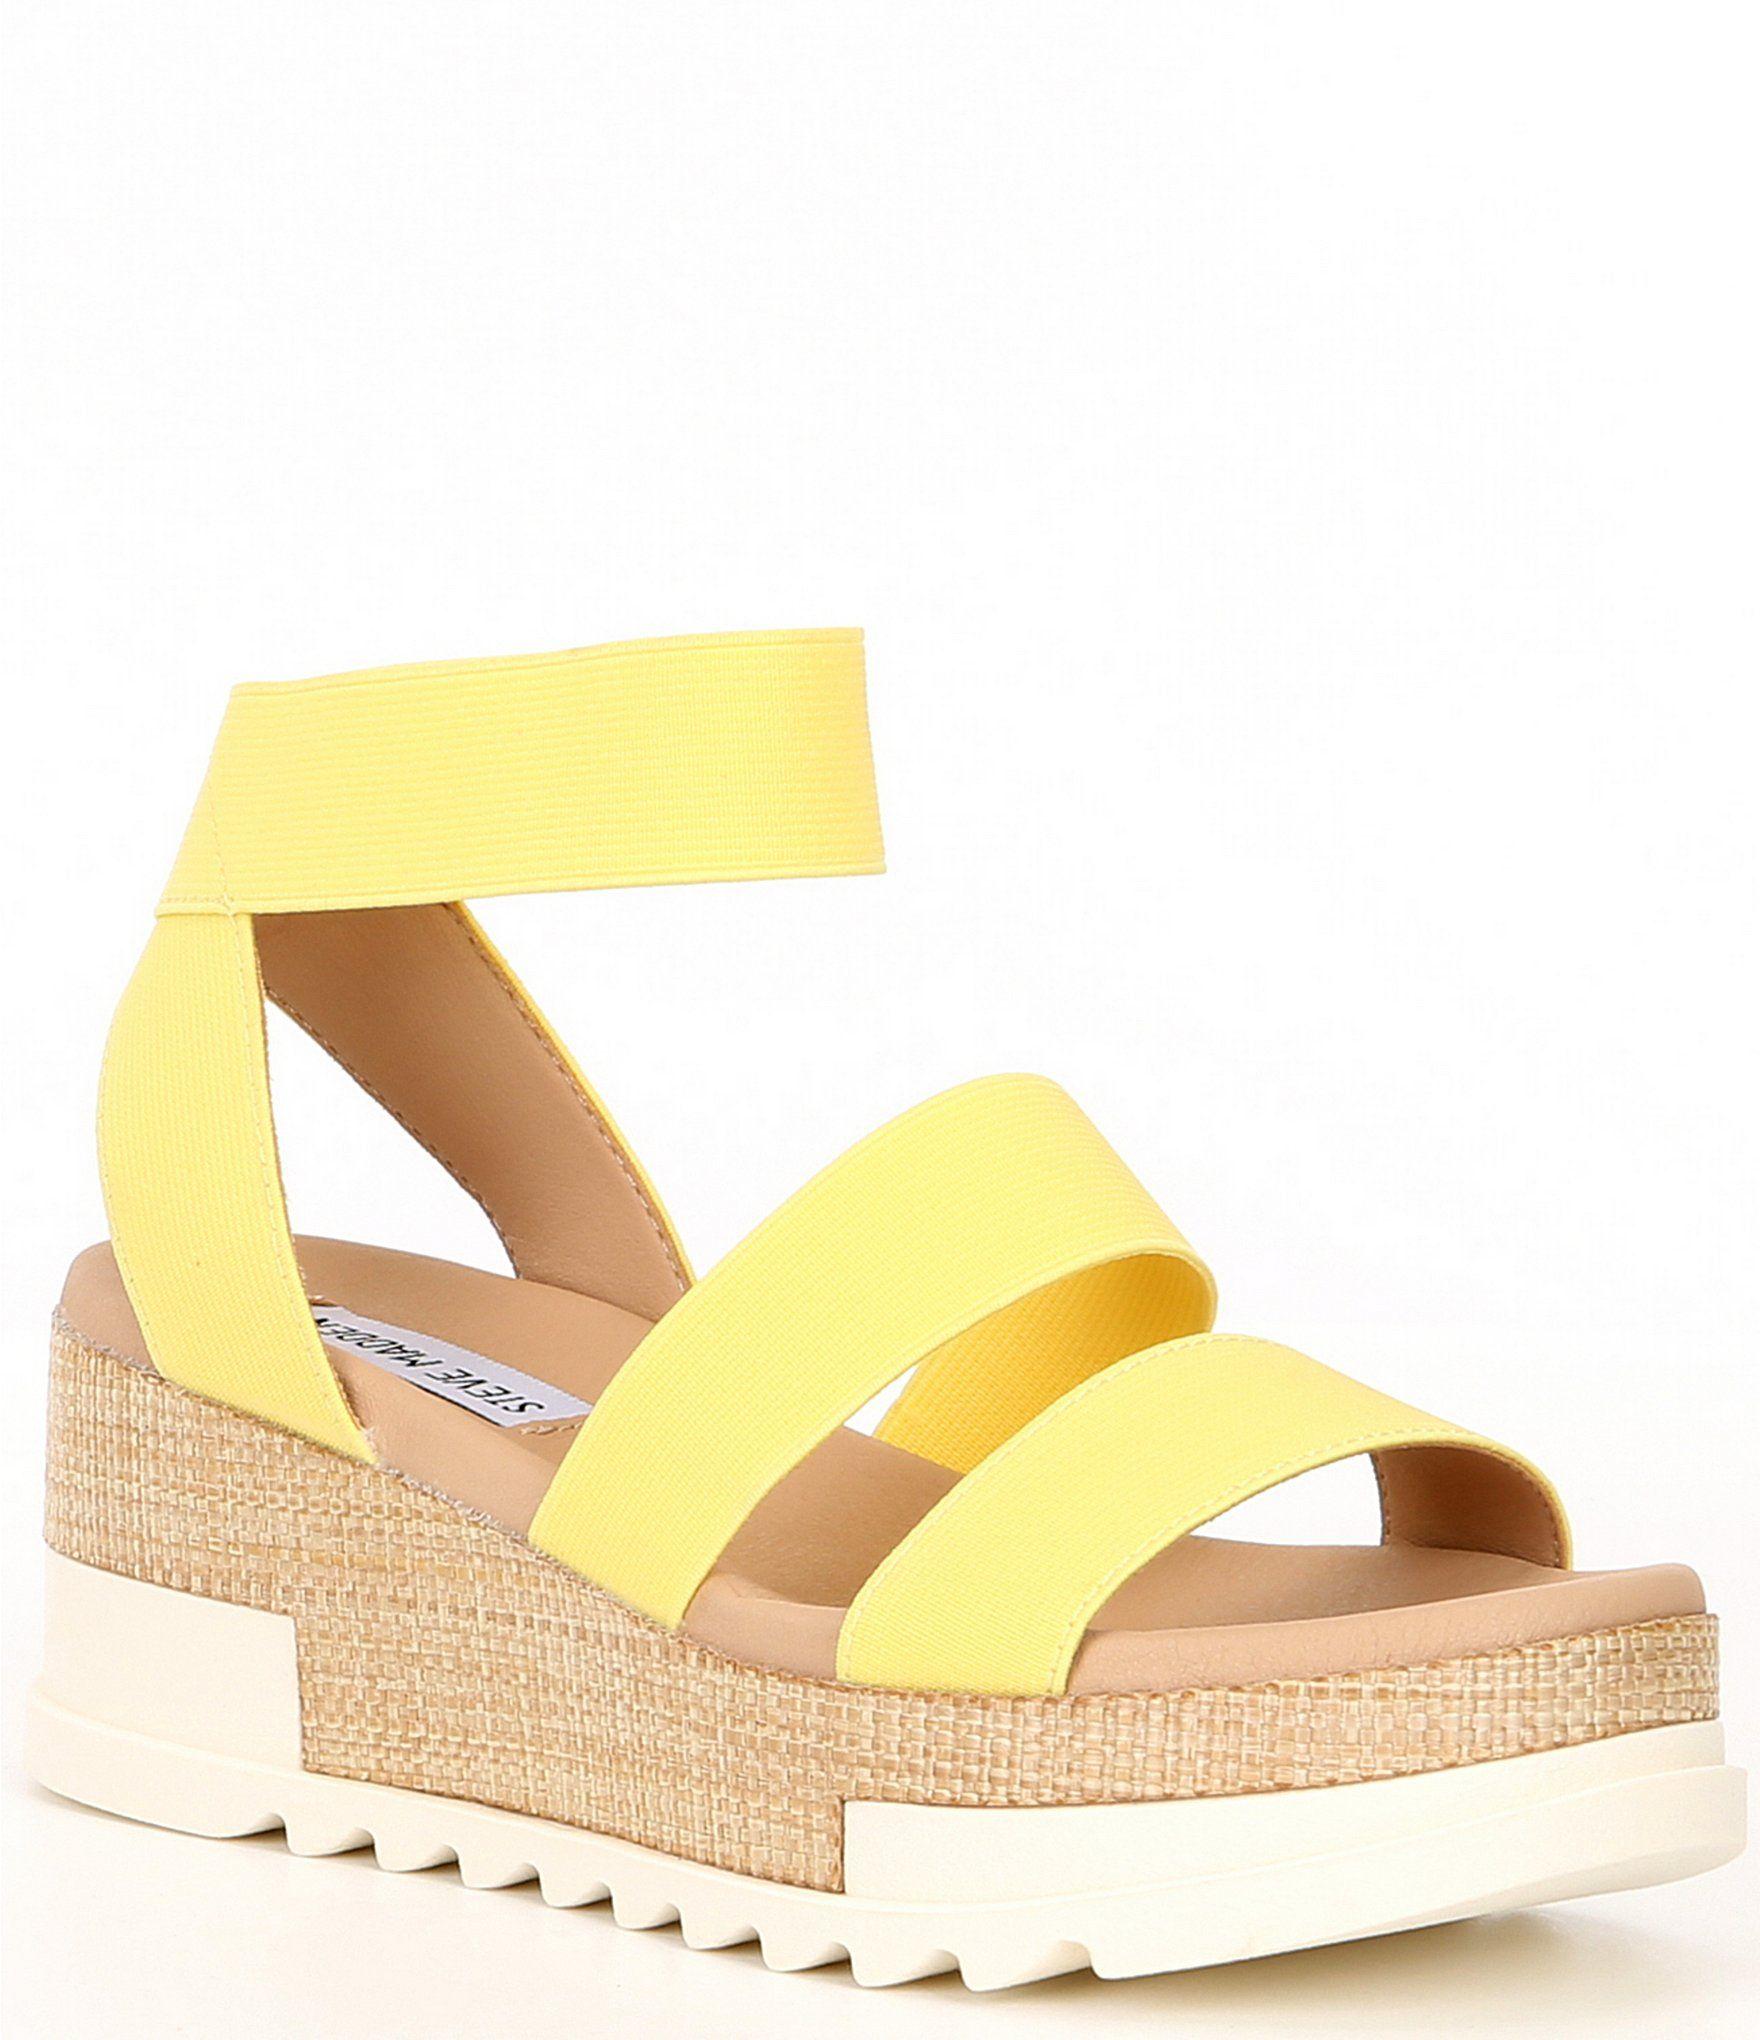 Steve Madden Birkley Elastic Strap Cork Flatform Sandals